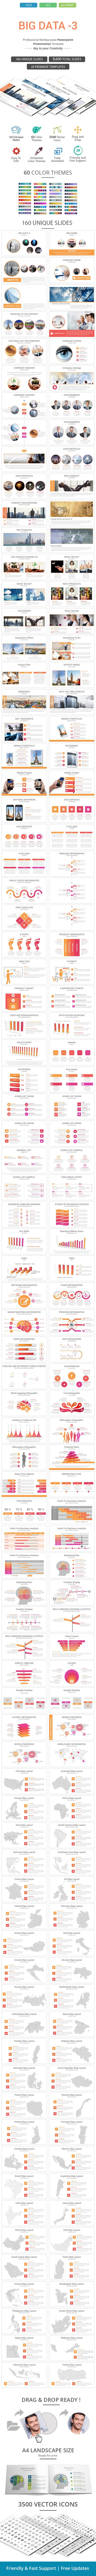 Big Data 3 PowerPoint Presentation Template